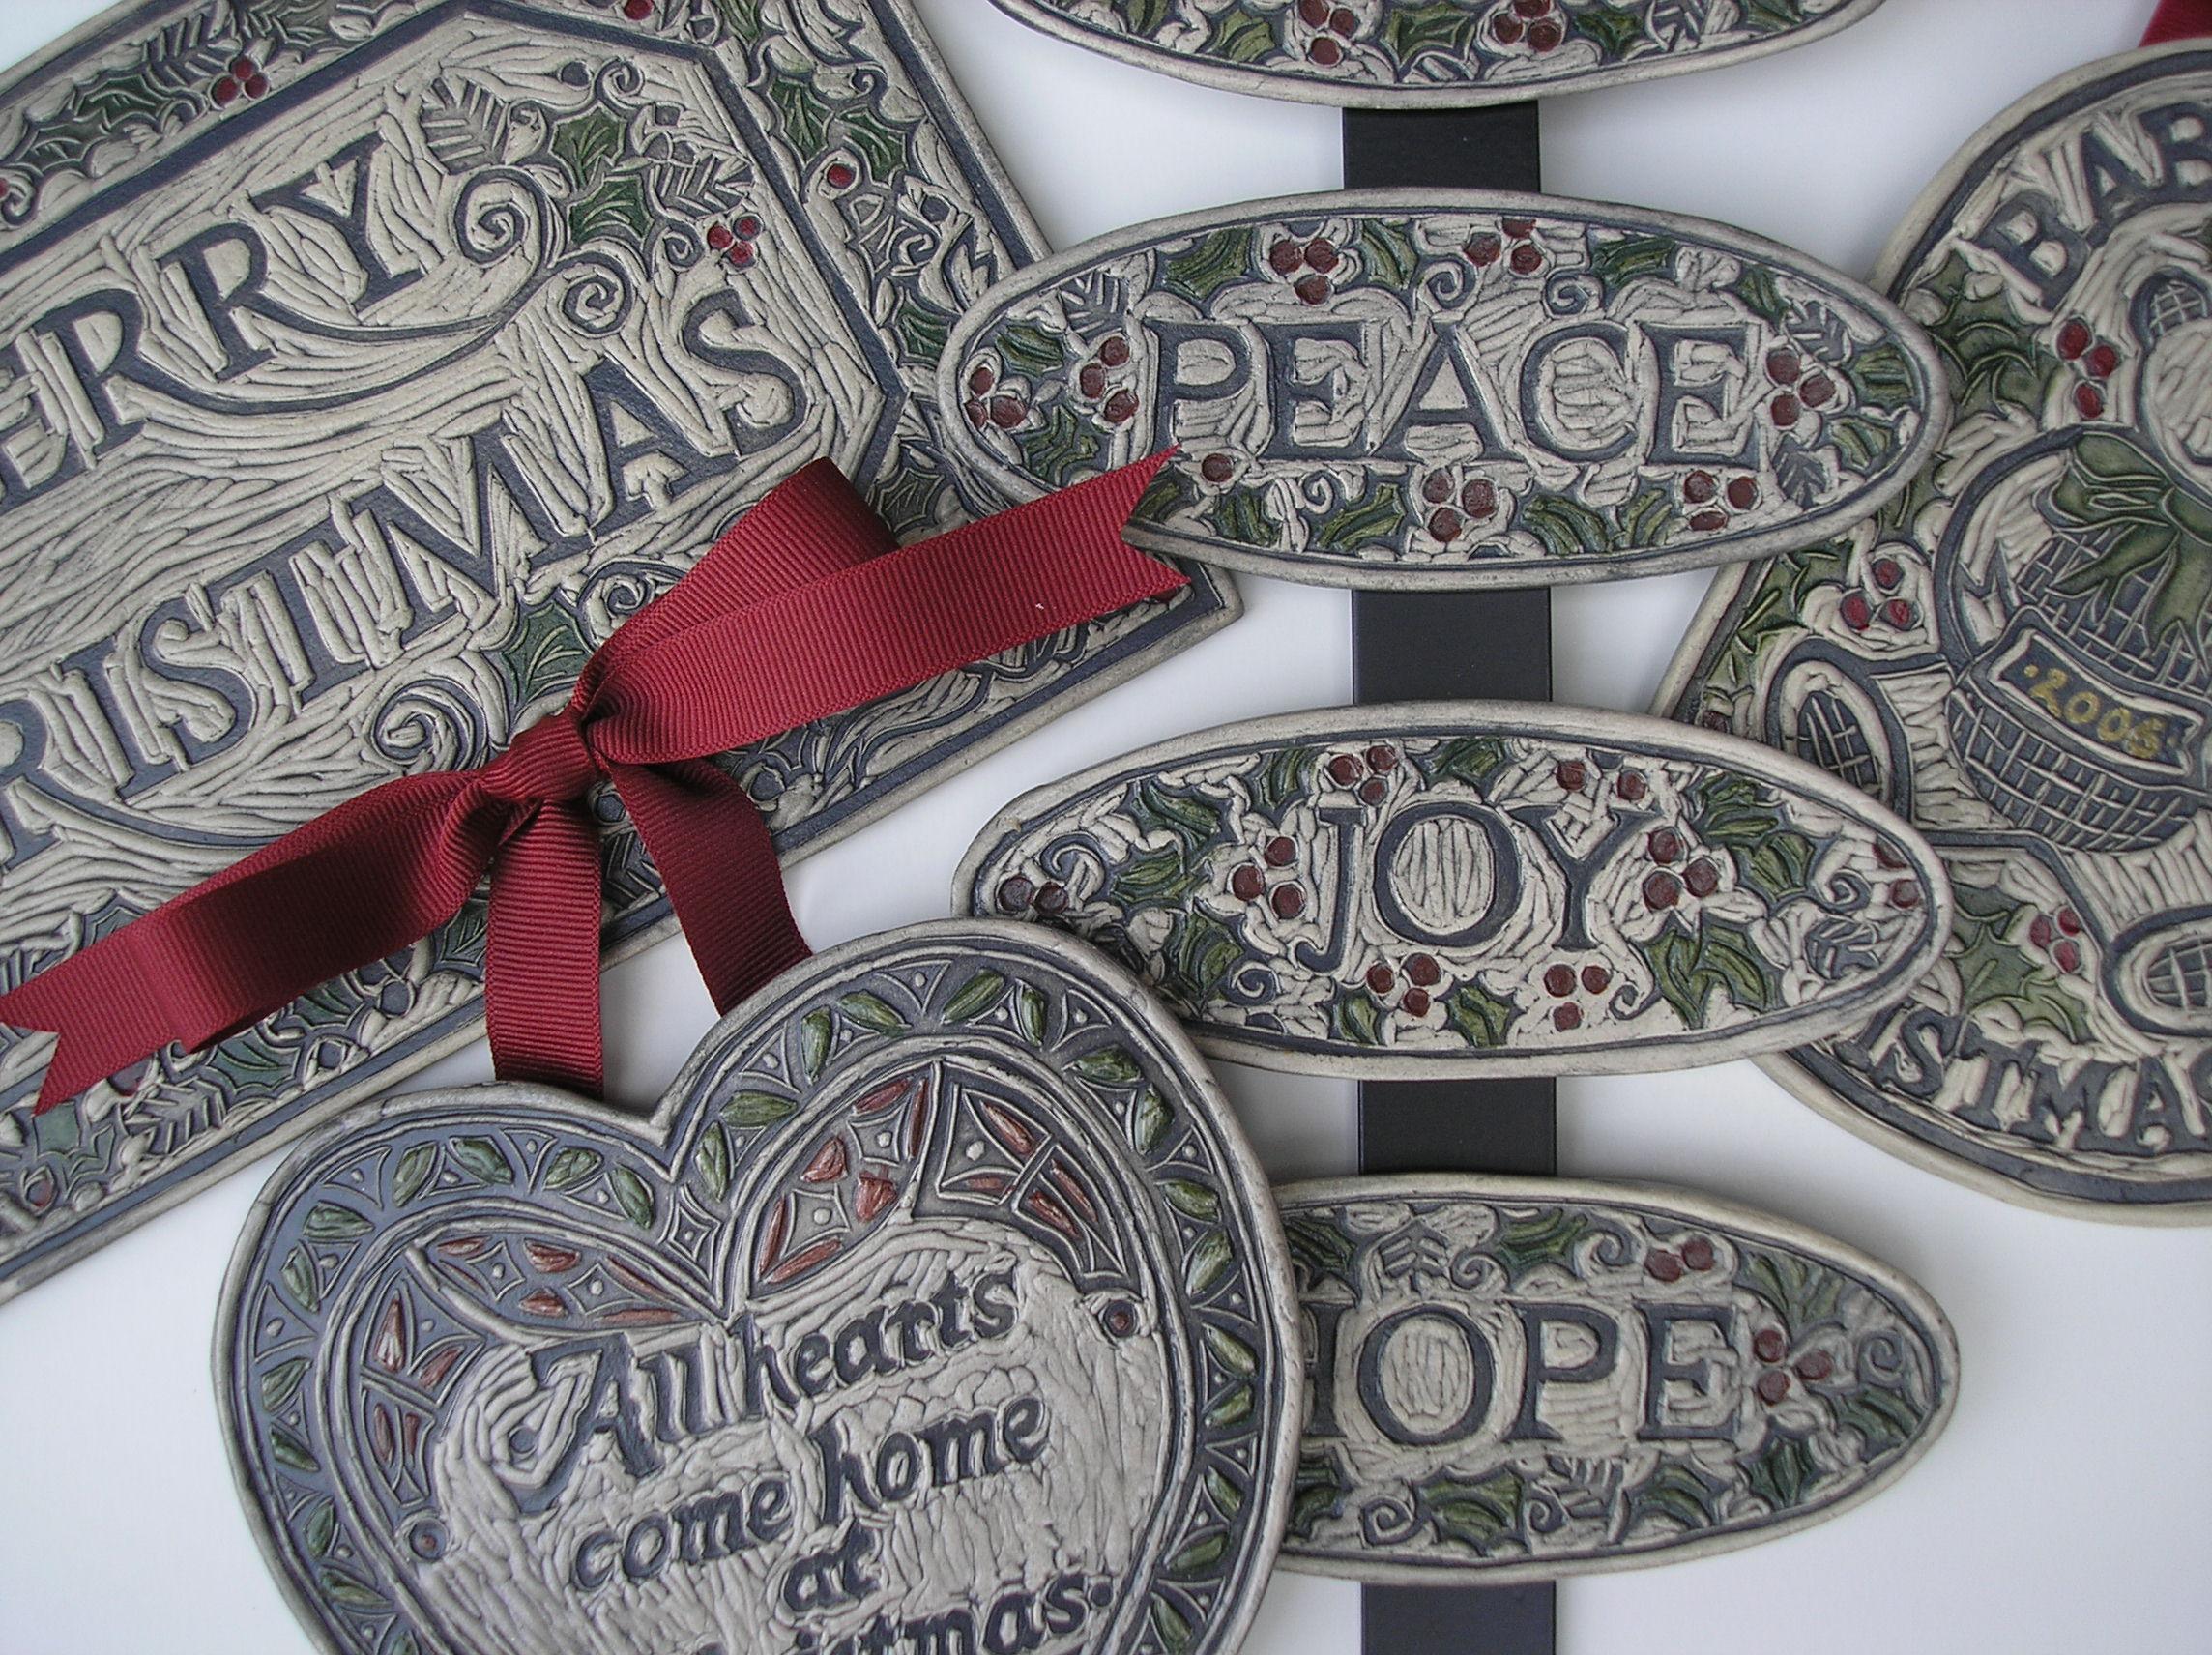 Christmas art tile designs